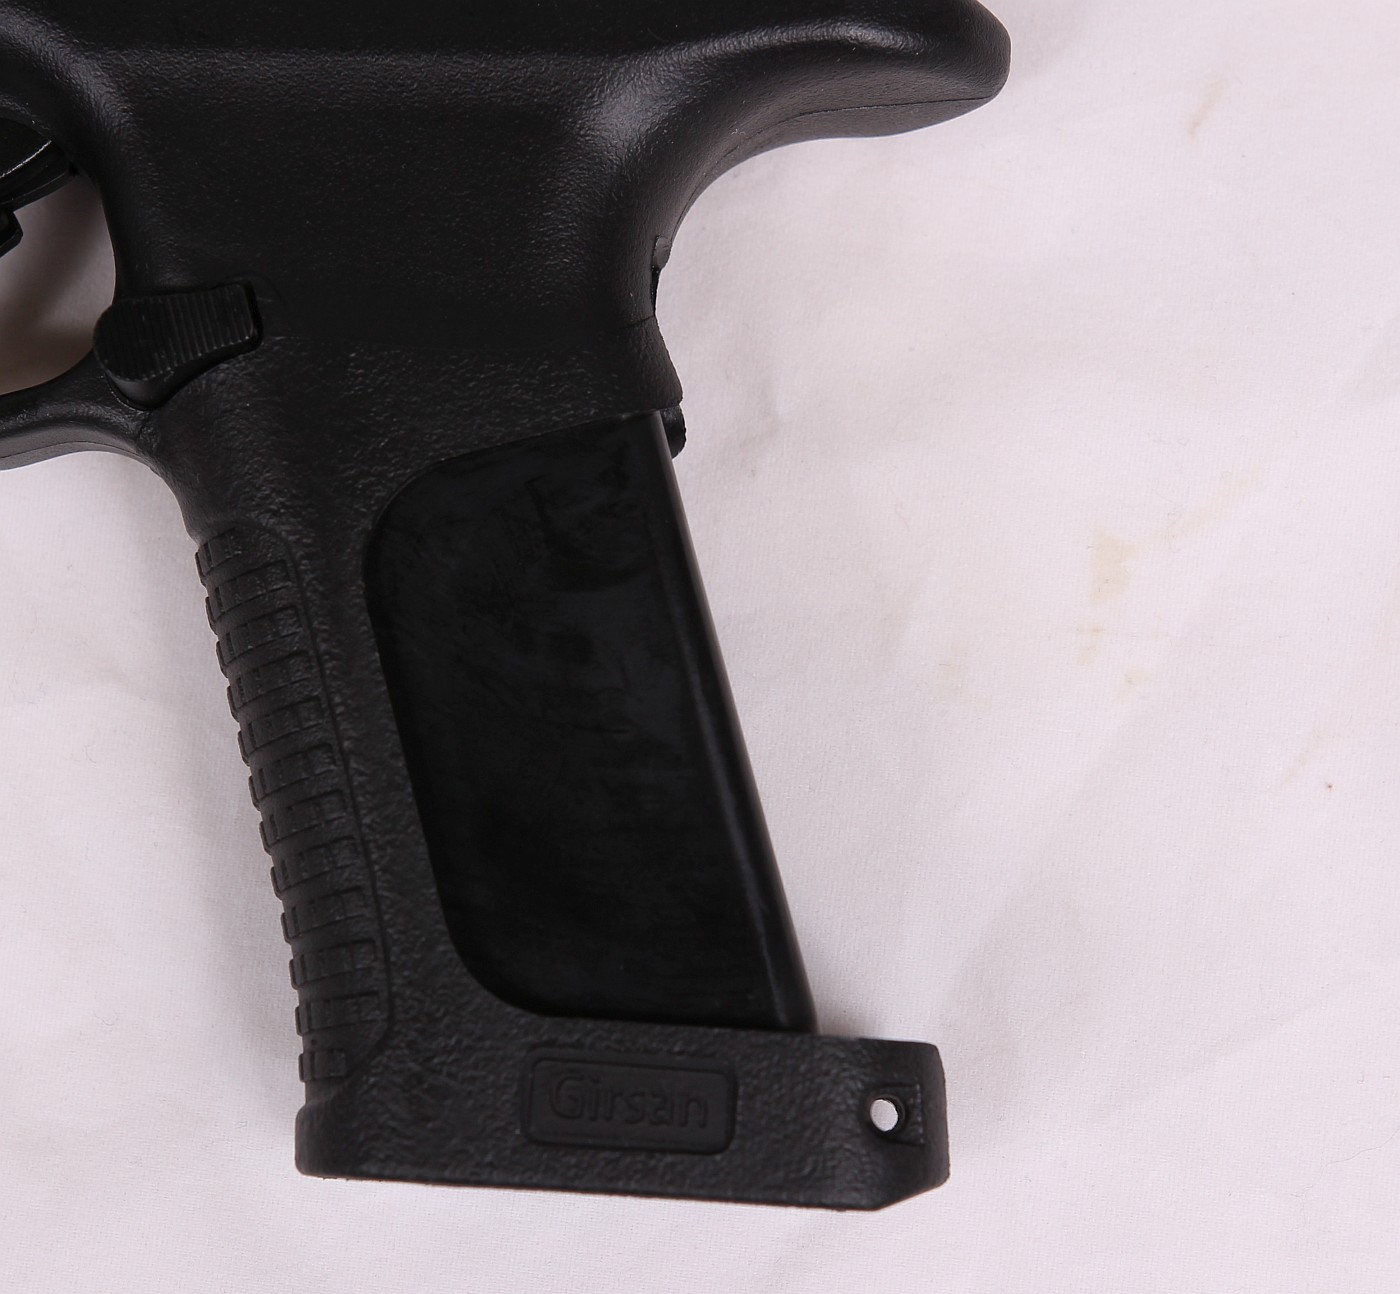 Girsan MC28SA Review | The Hunting Gear Guy